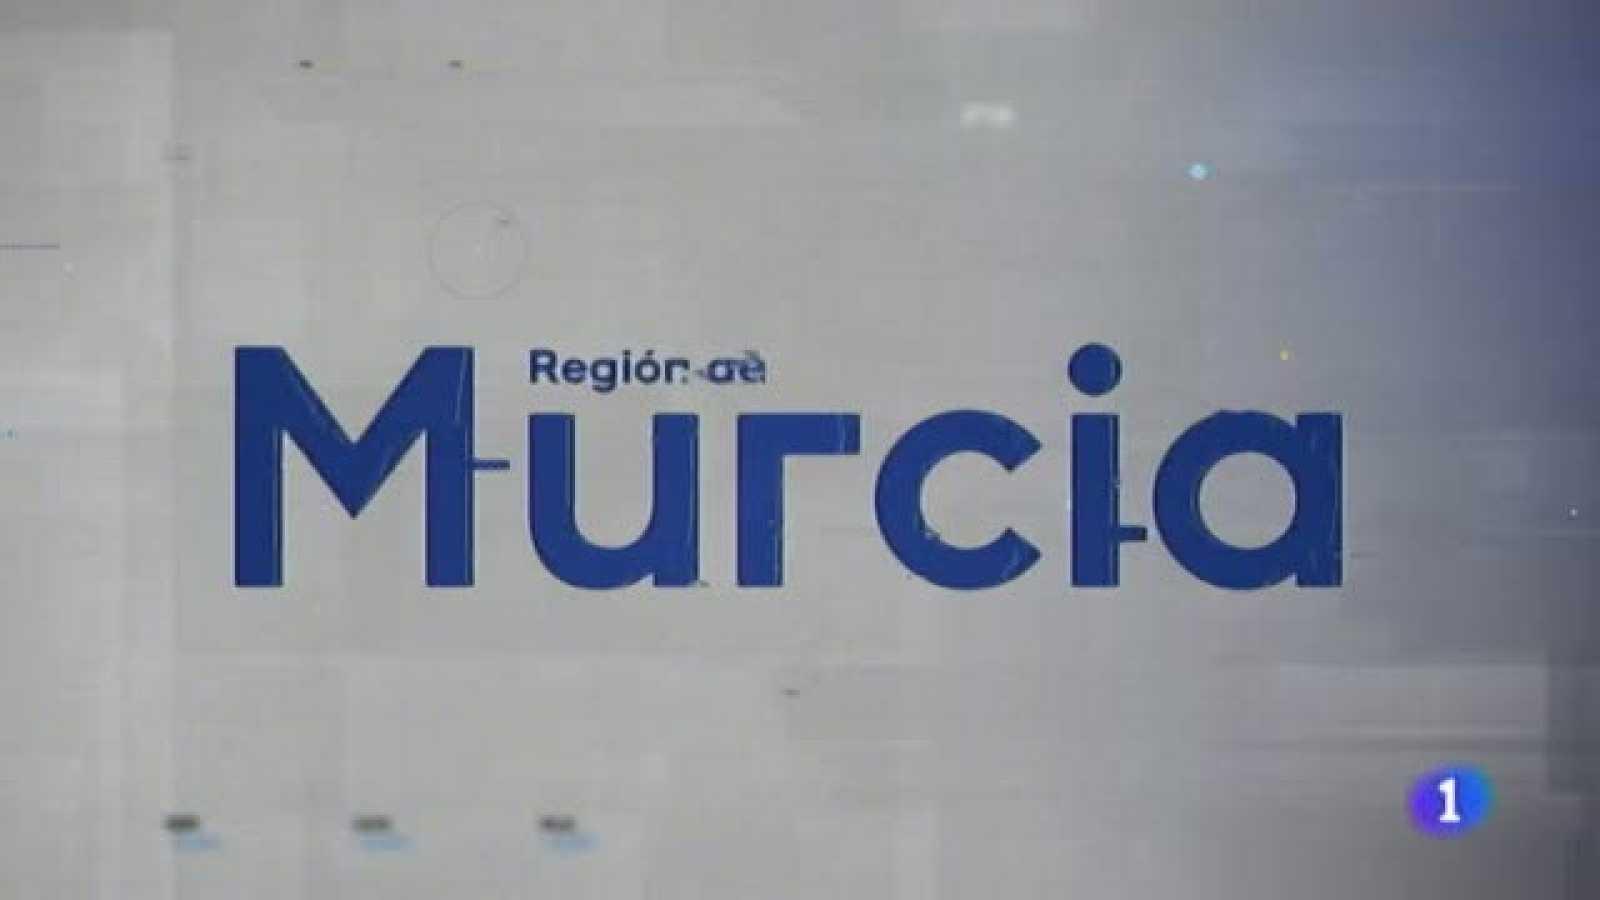 Noticias Murcia - 29/04/2021